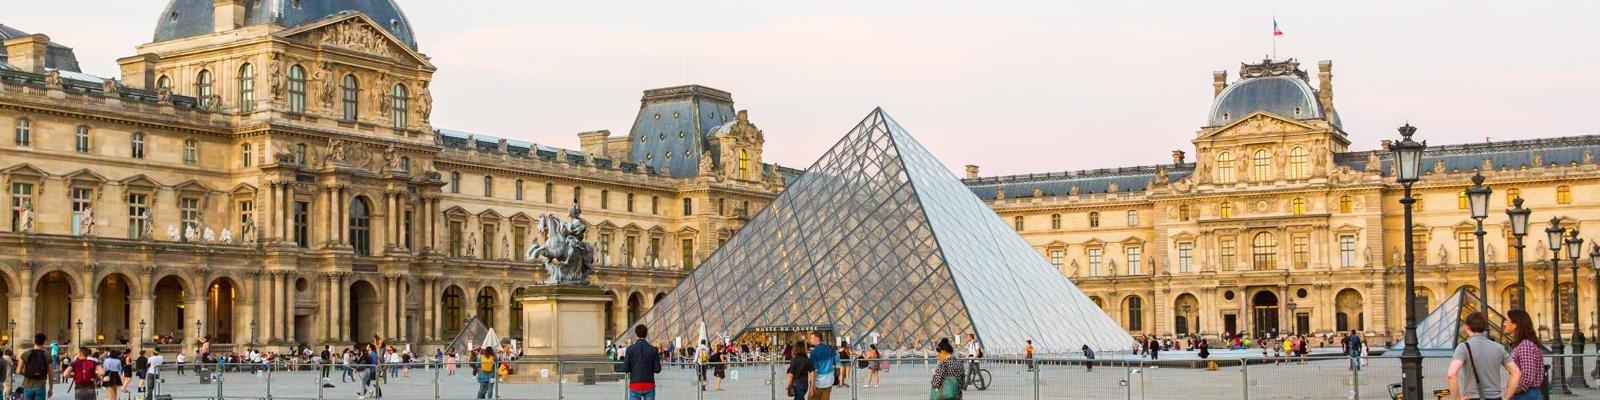 Must-See Museums in Paris